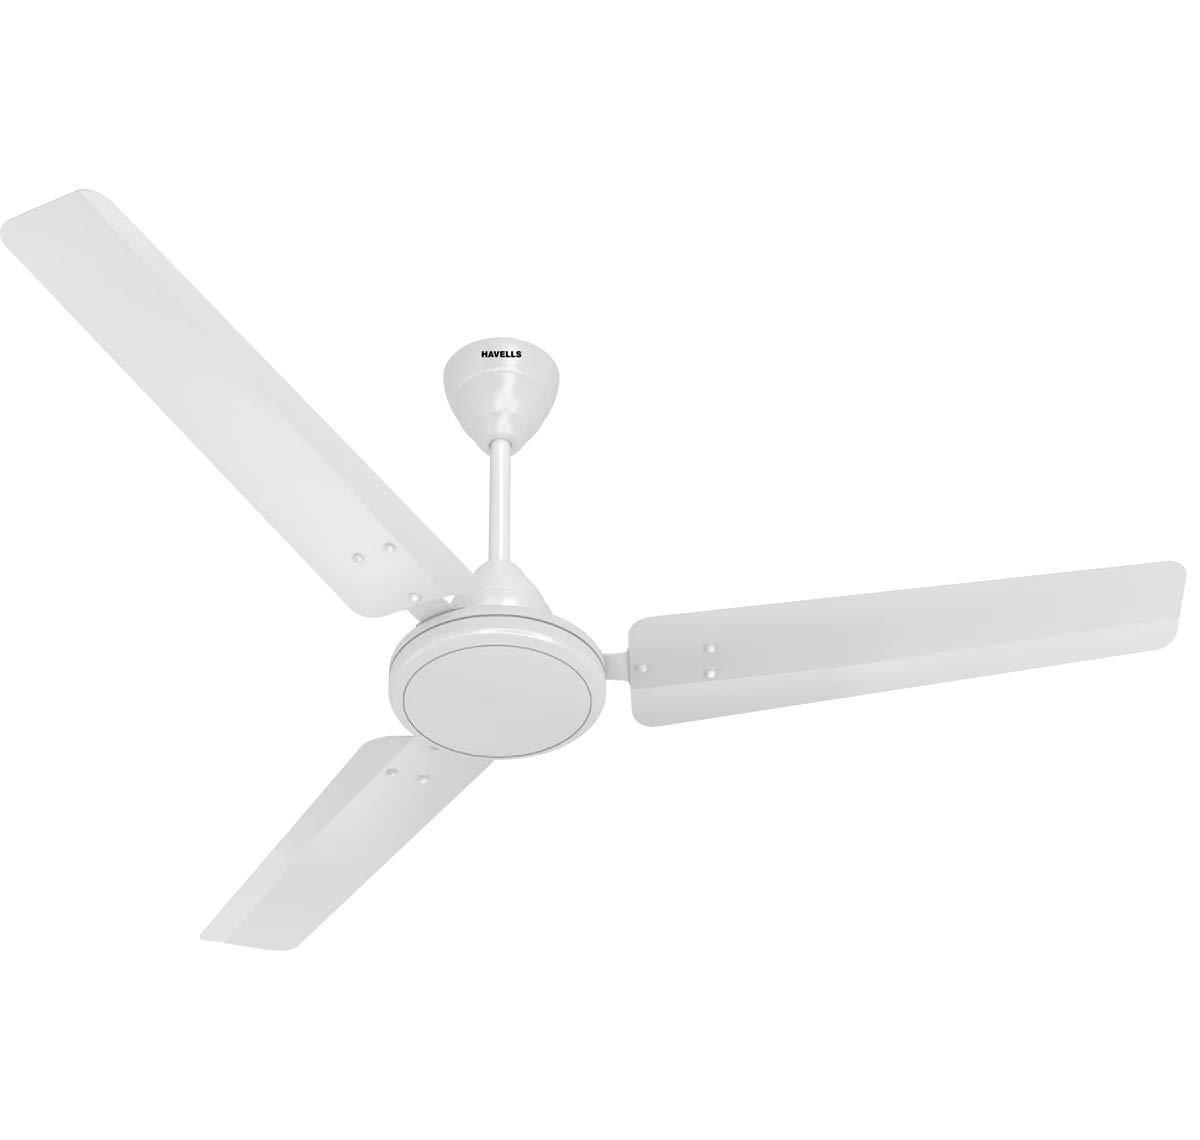 Havells Mozel 1200 mm 3 Blade Ceiling Fan